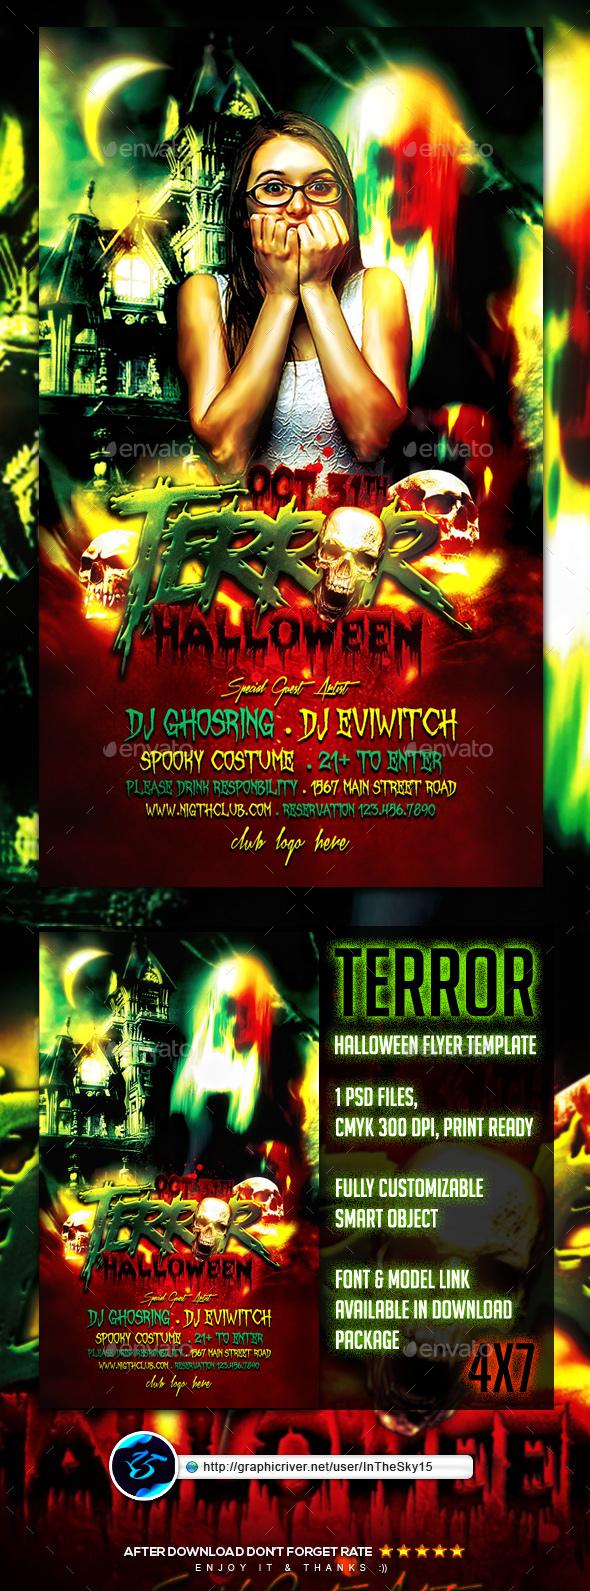 Terror Halloween Flyer Template - Flyers Print Templates